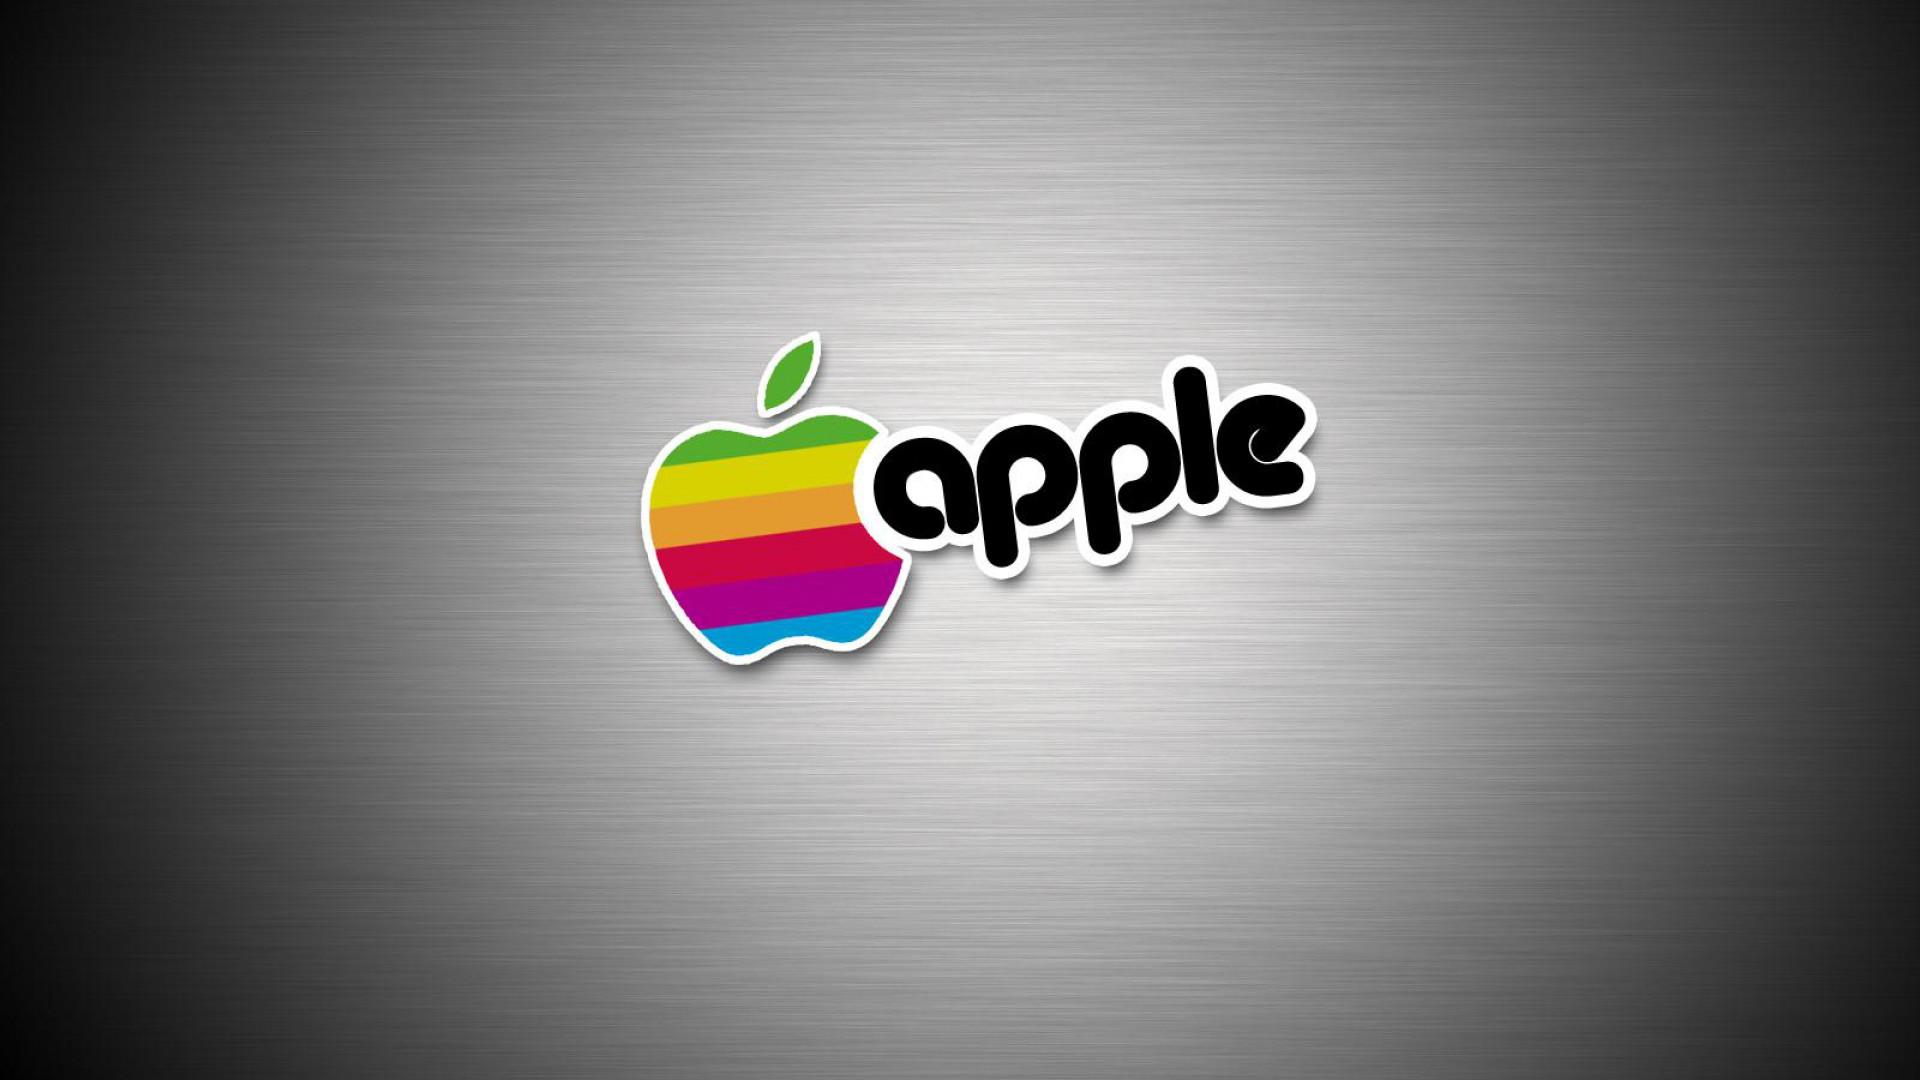 Apple-Logo-Background-HD-wallpaper-wp3602659